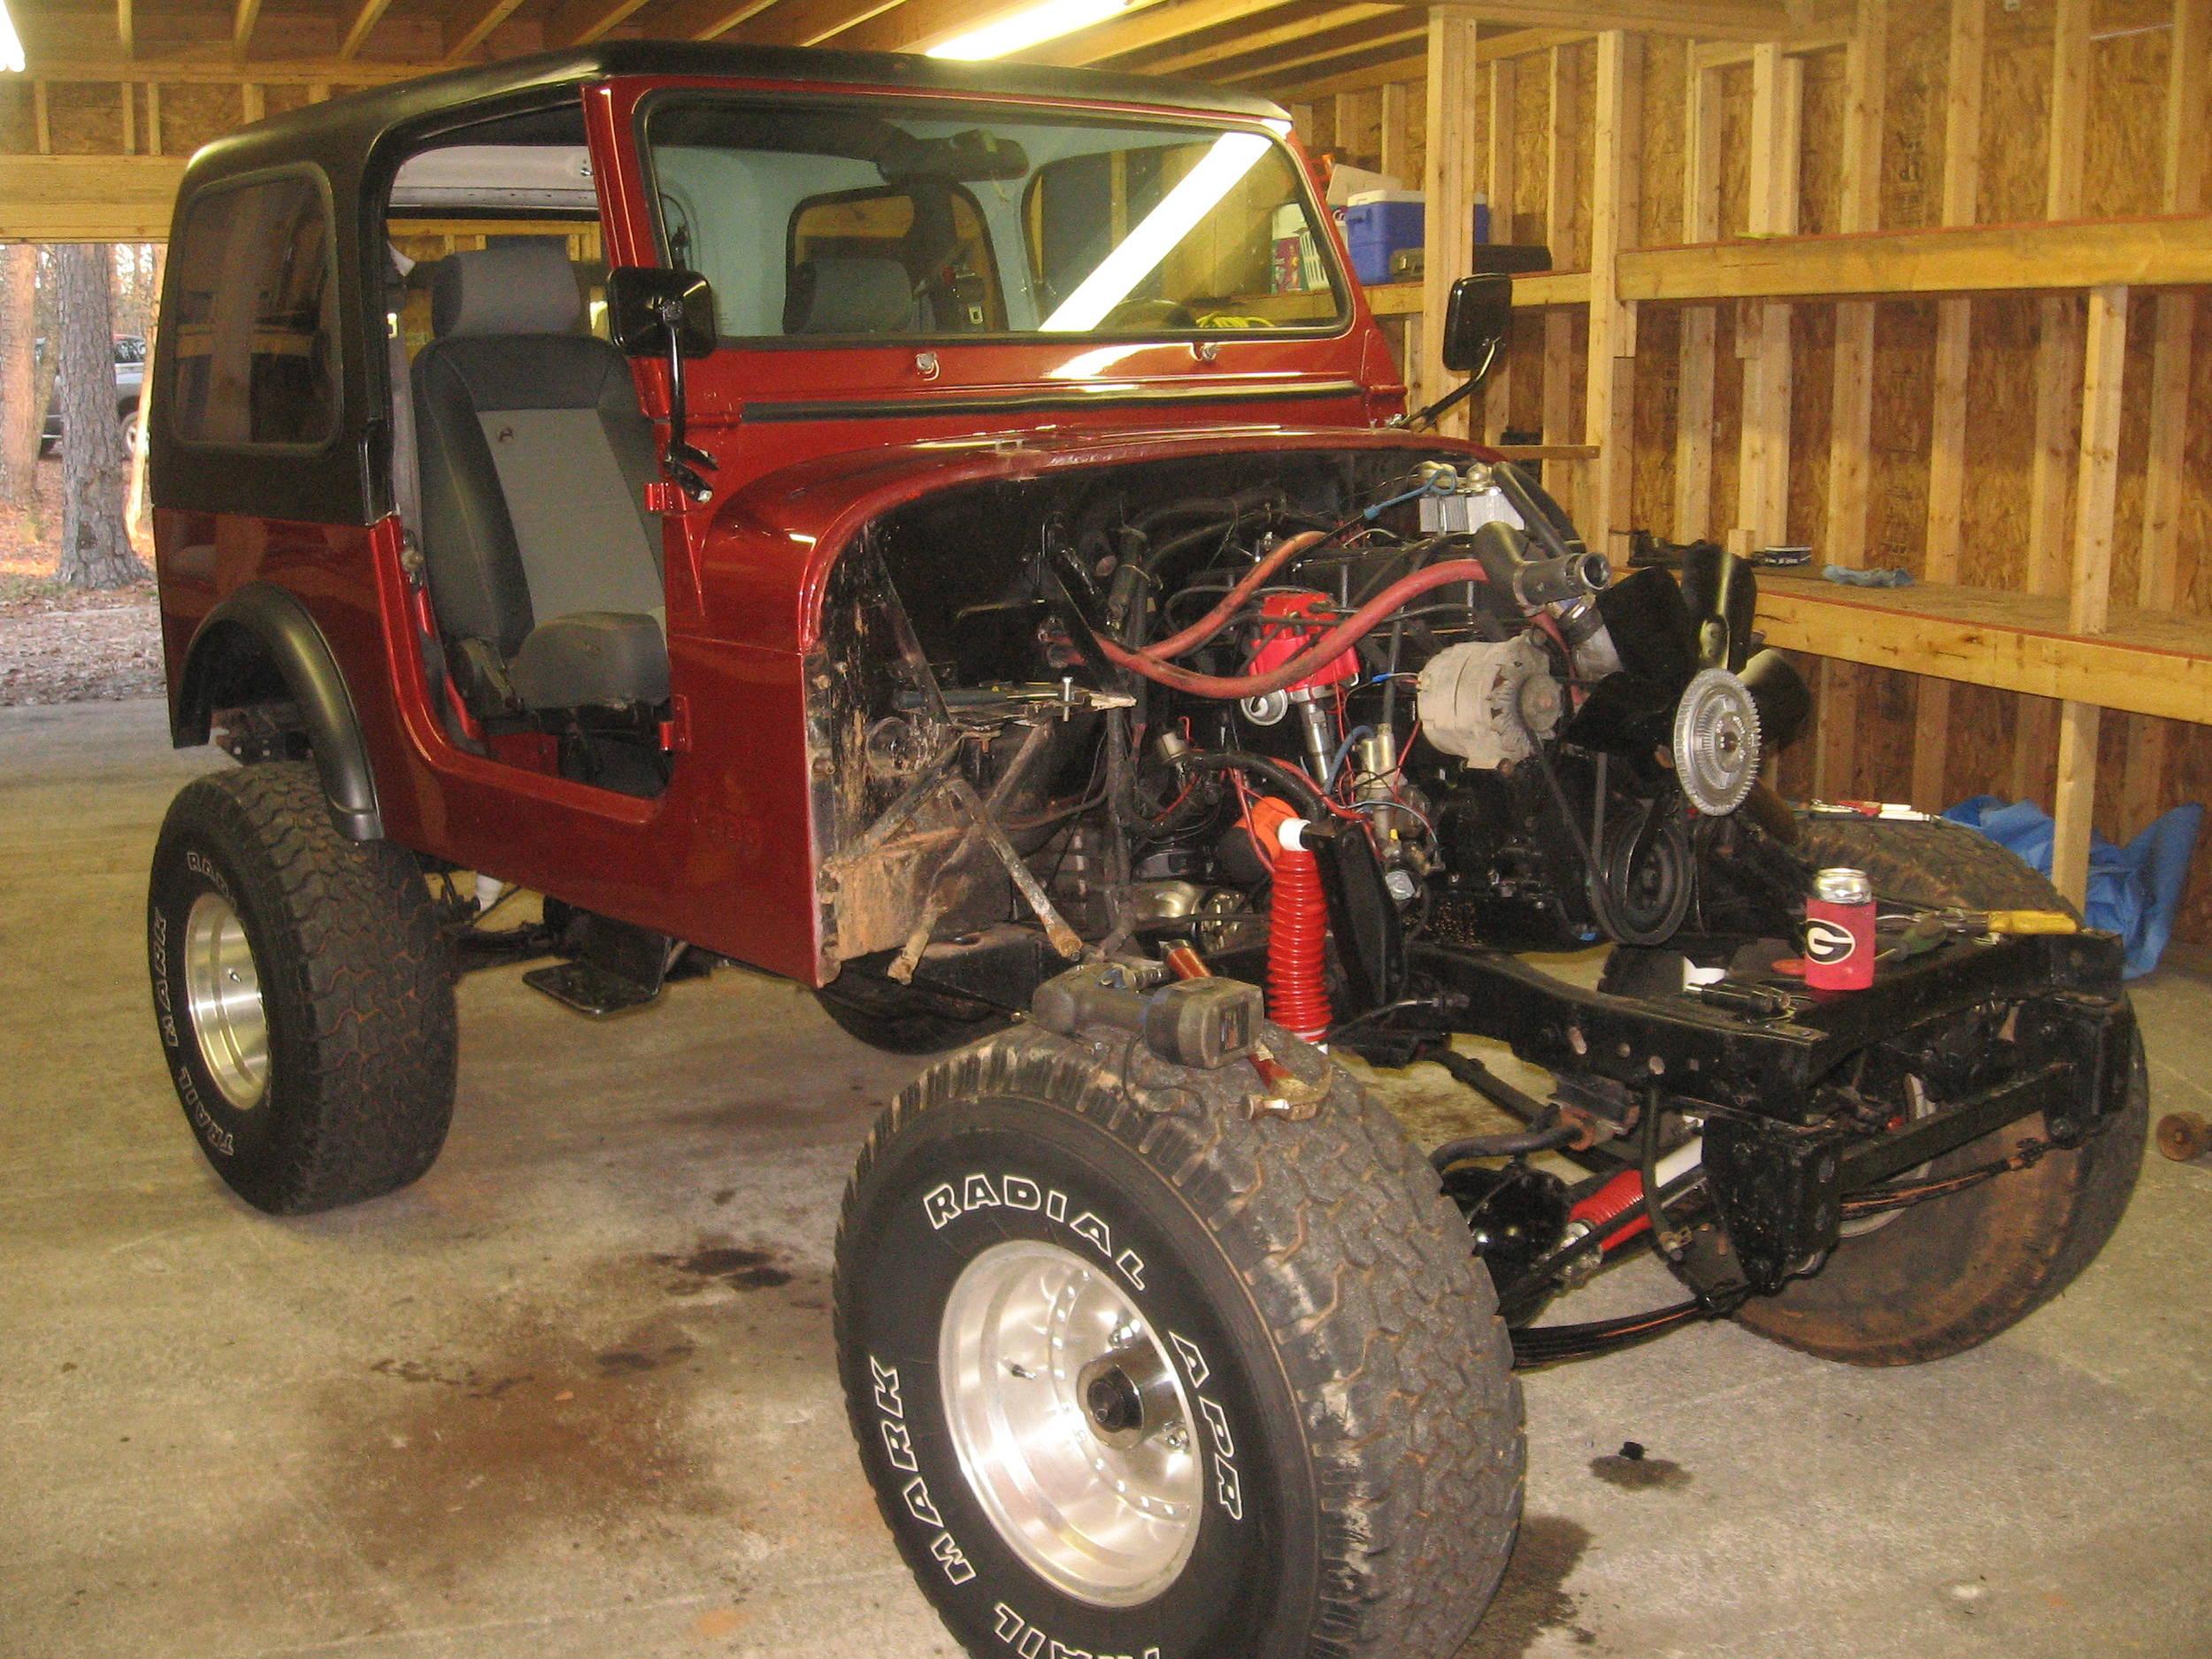 Jeep_Rebuild_12-5-11_022.jpg